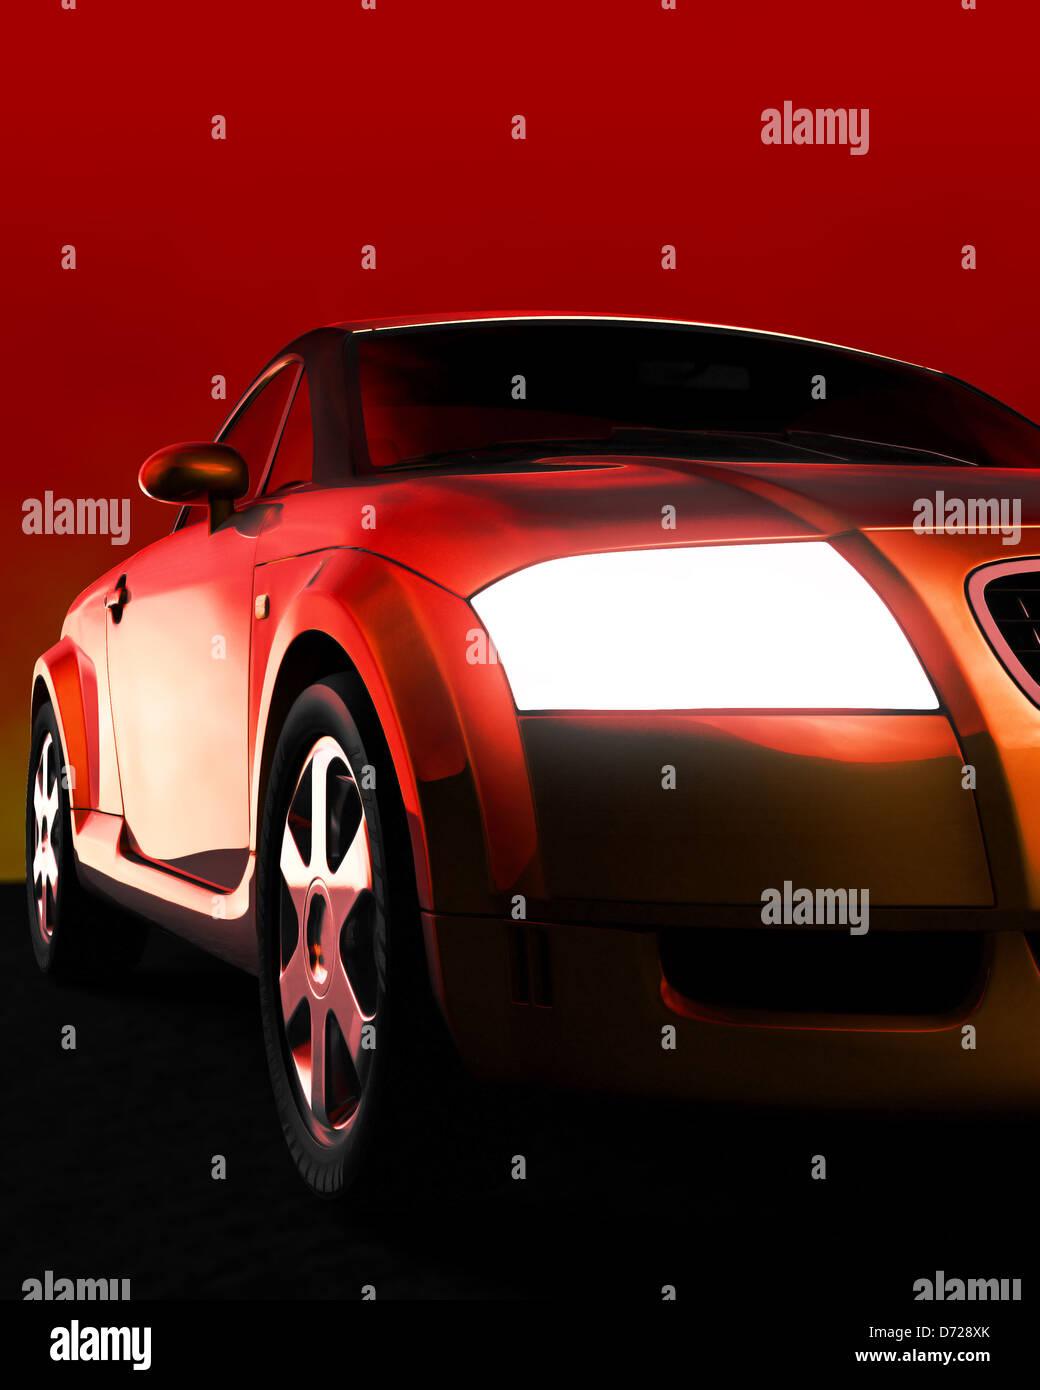 Car illustration Photo Stock